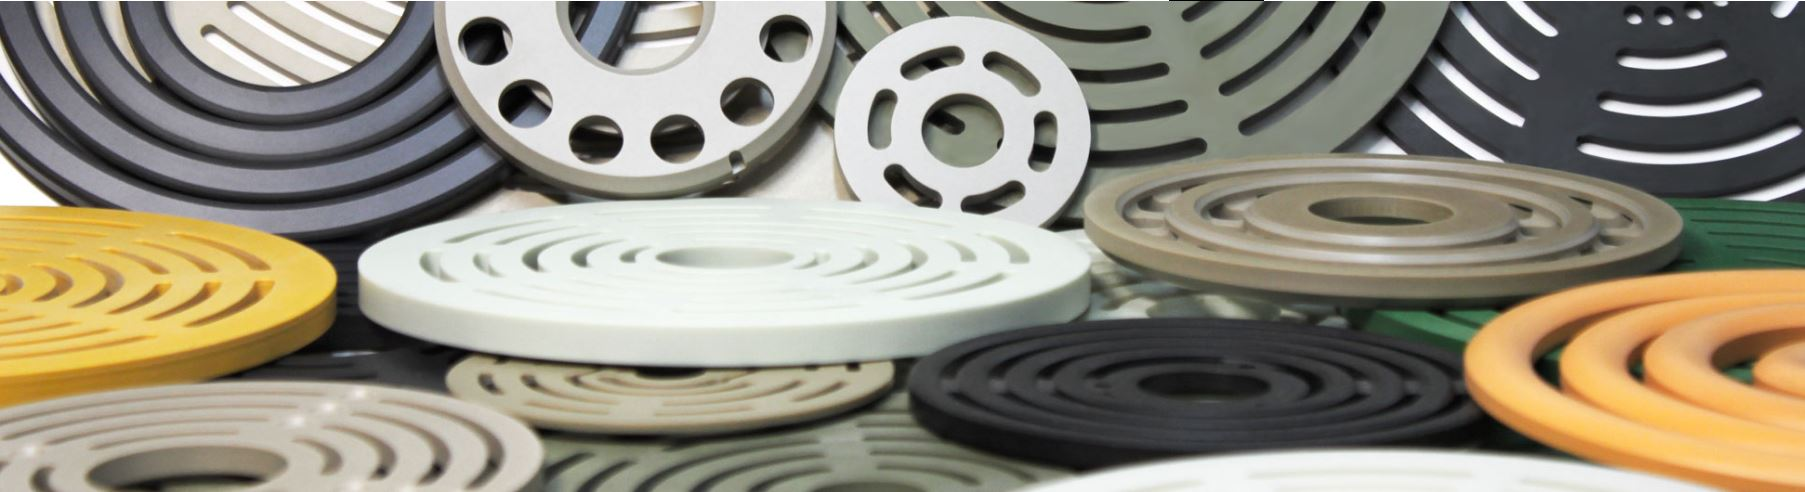 Thermoplastic Parts | KB Delta